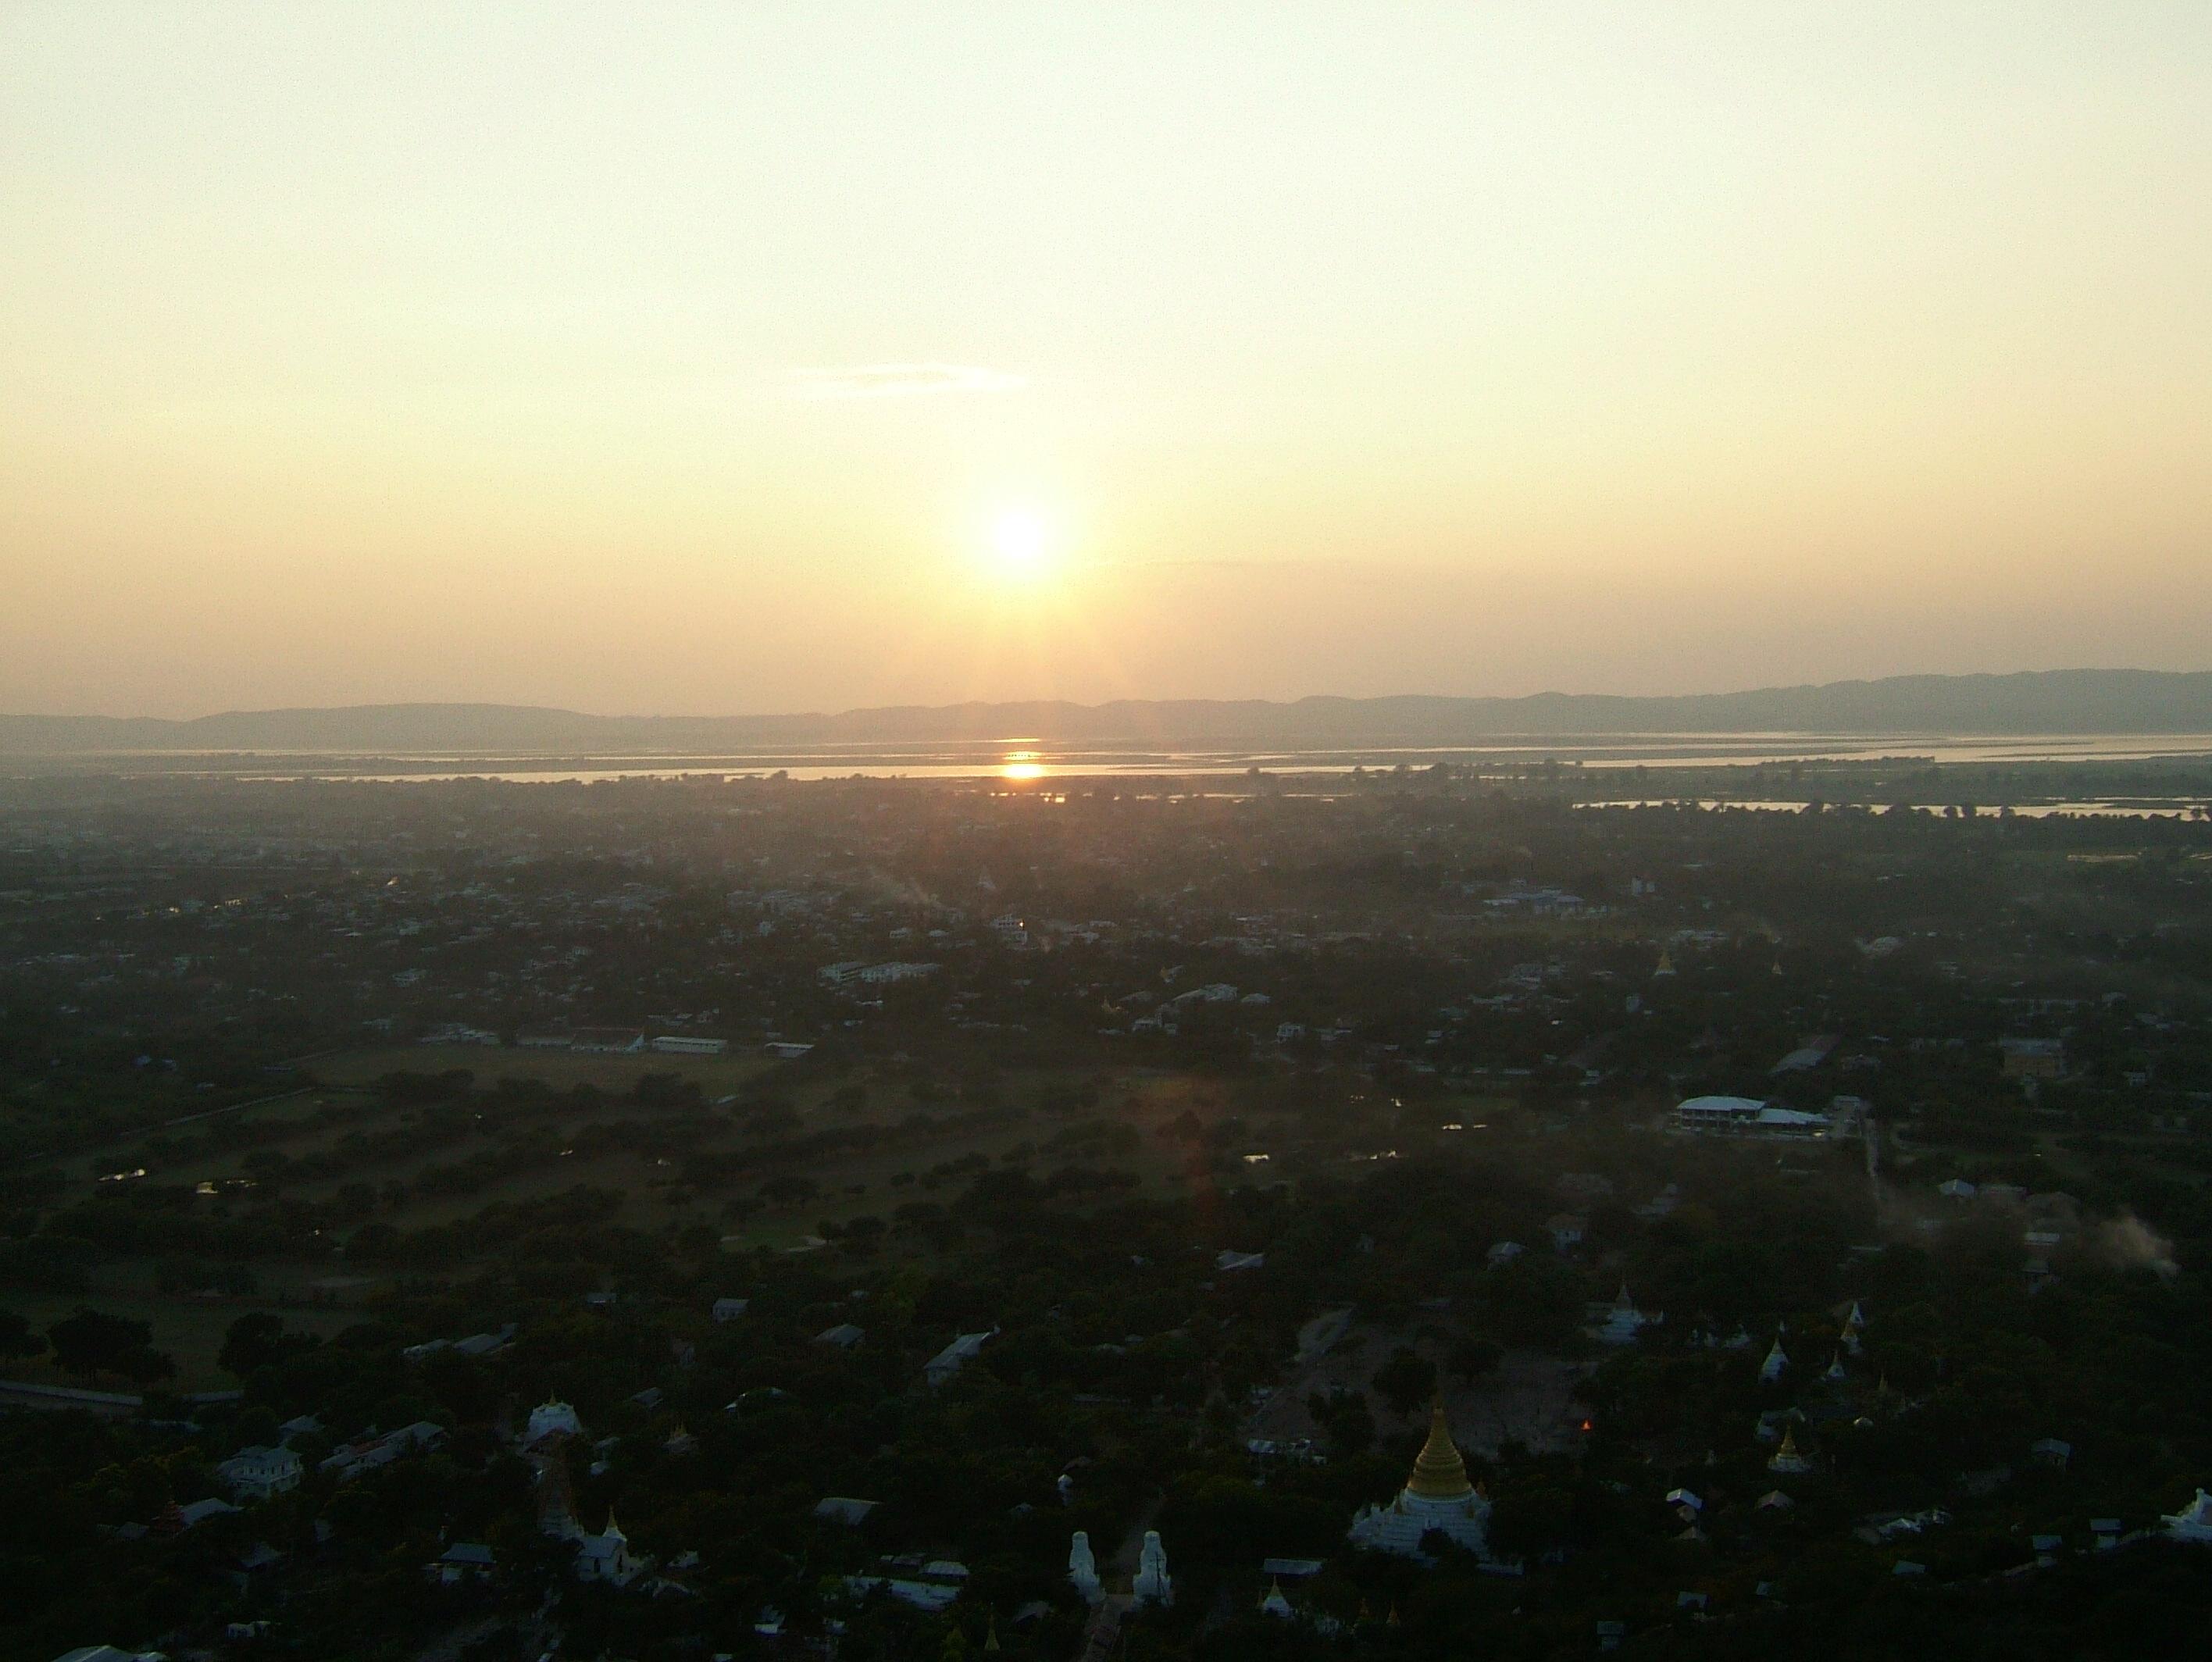 Mandalay Hill Sutaungpyei Pagoda sunset Nov 2004 03